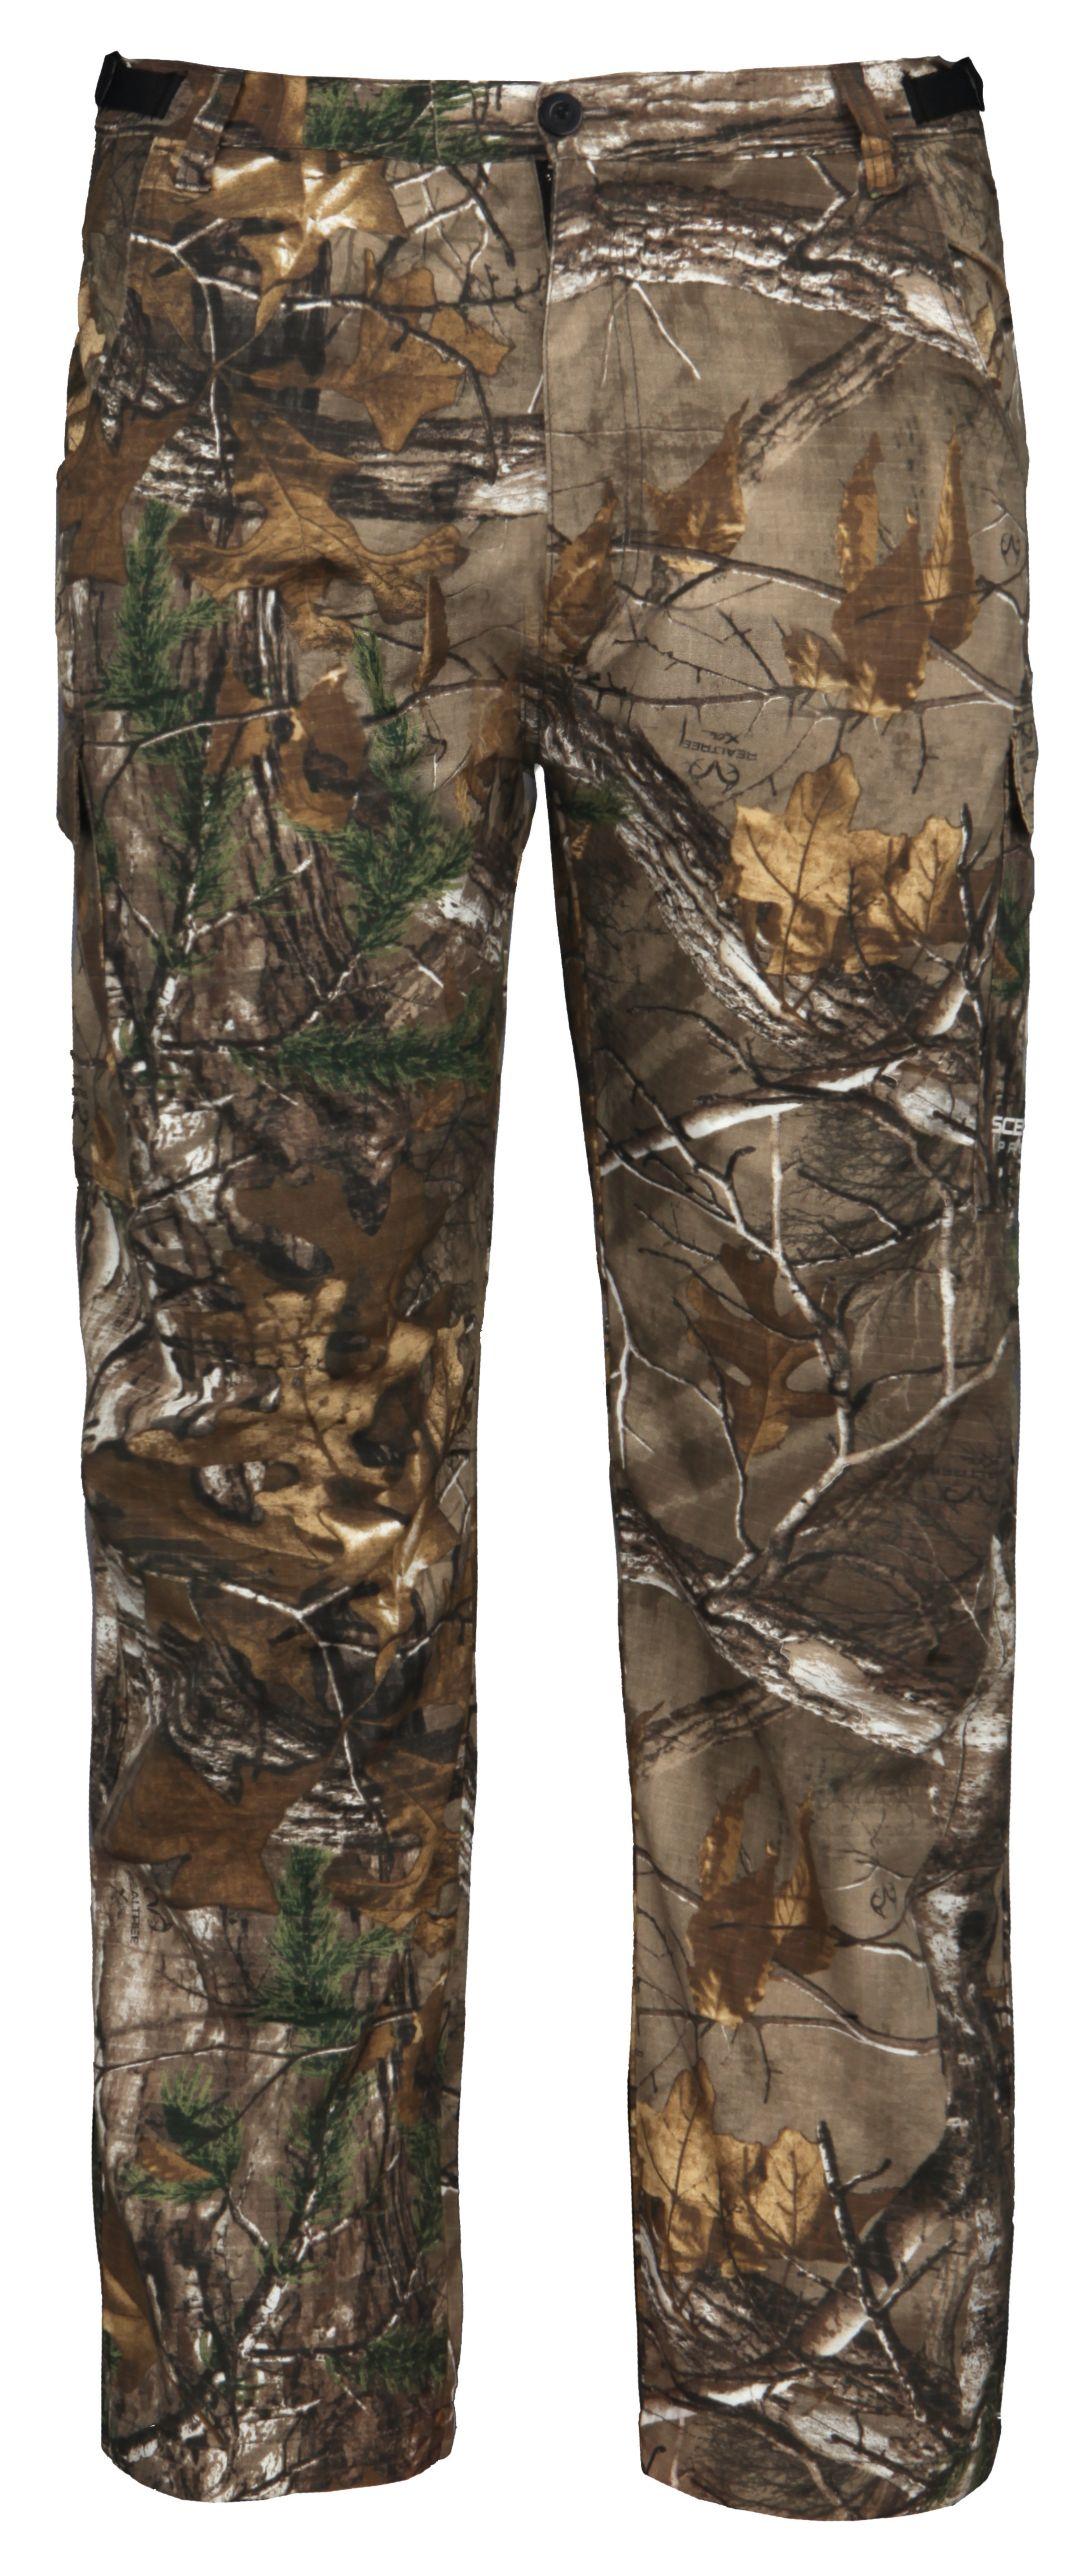 9773c607cdeac RealTree Men's Ripstop Hunting Pants   Field & Stream